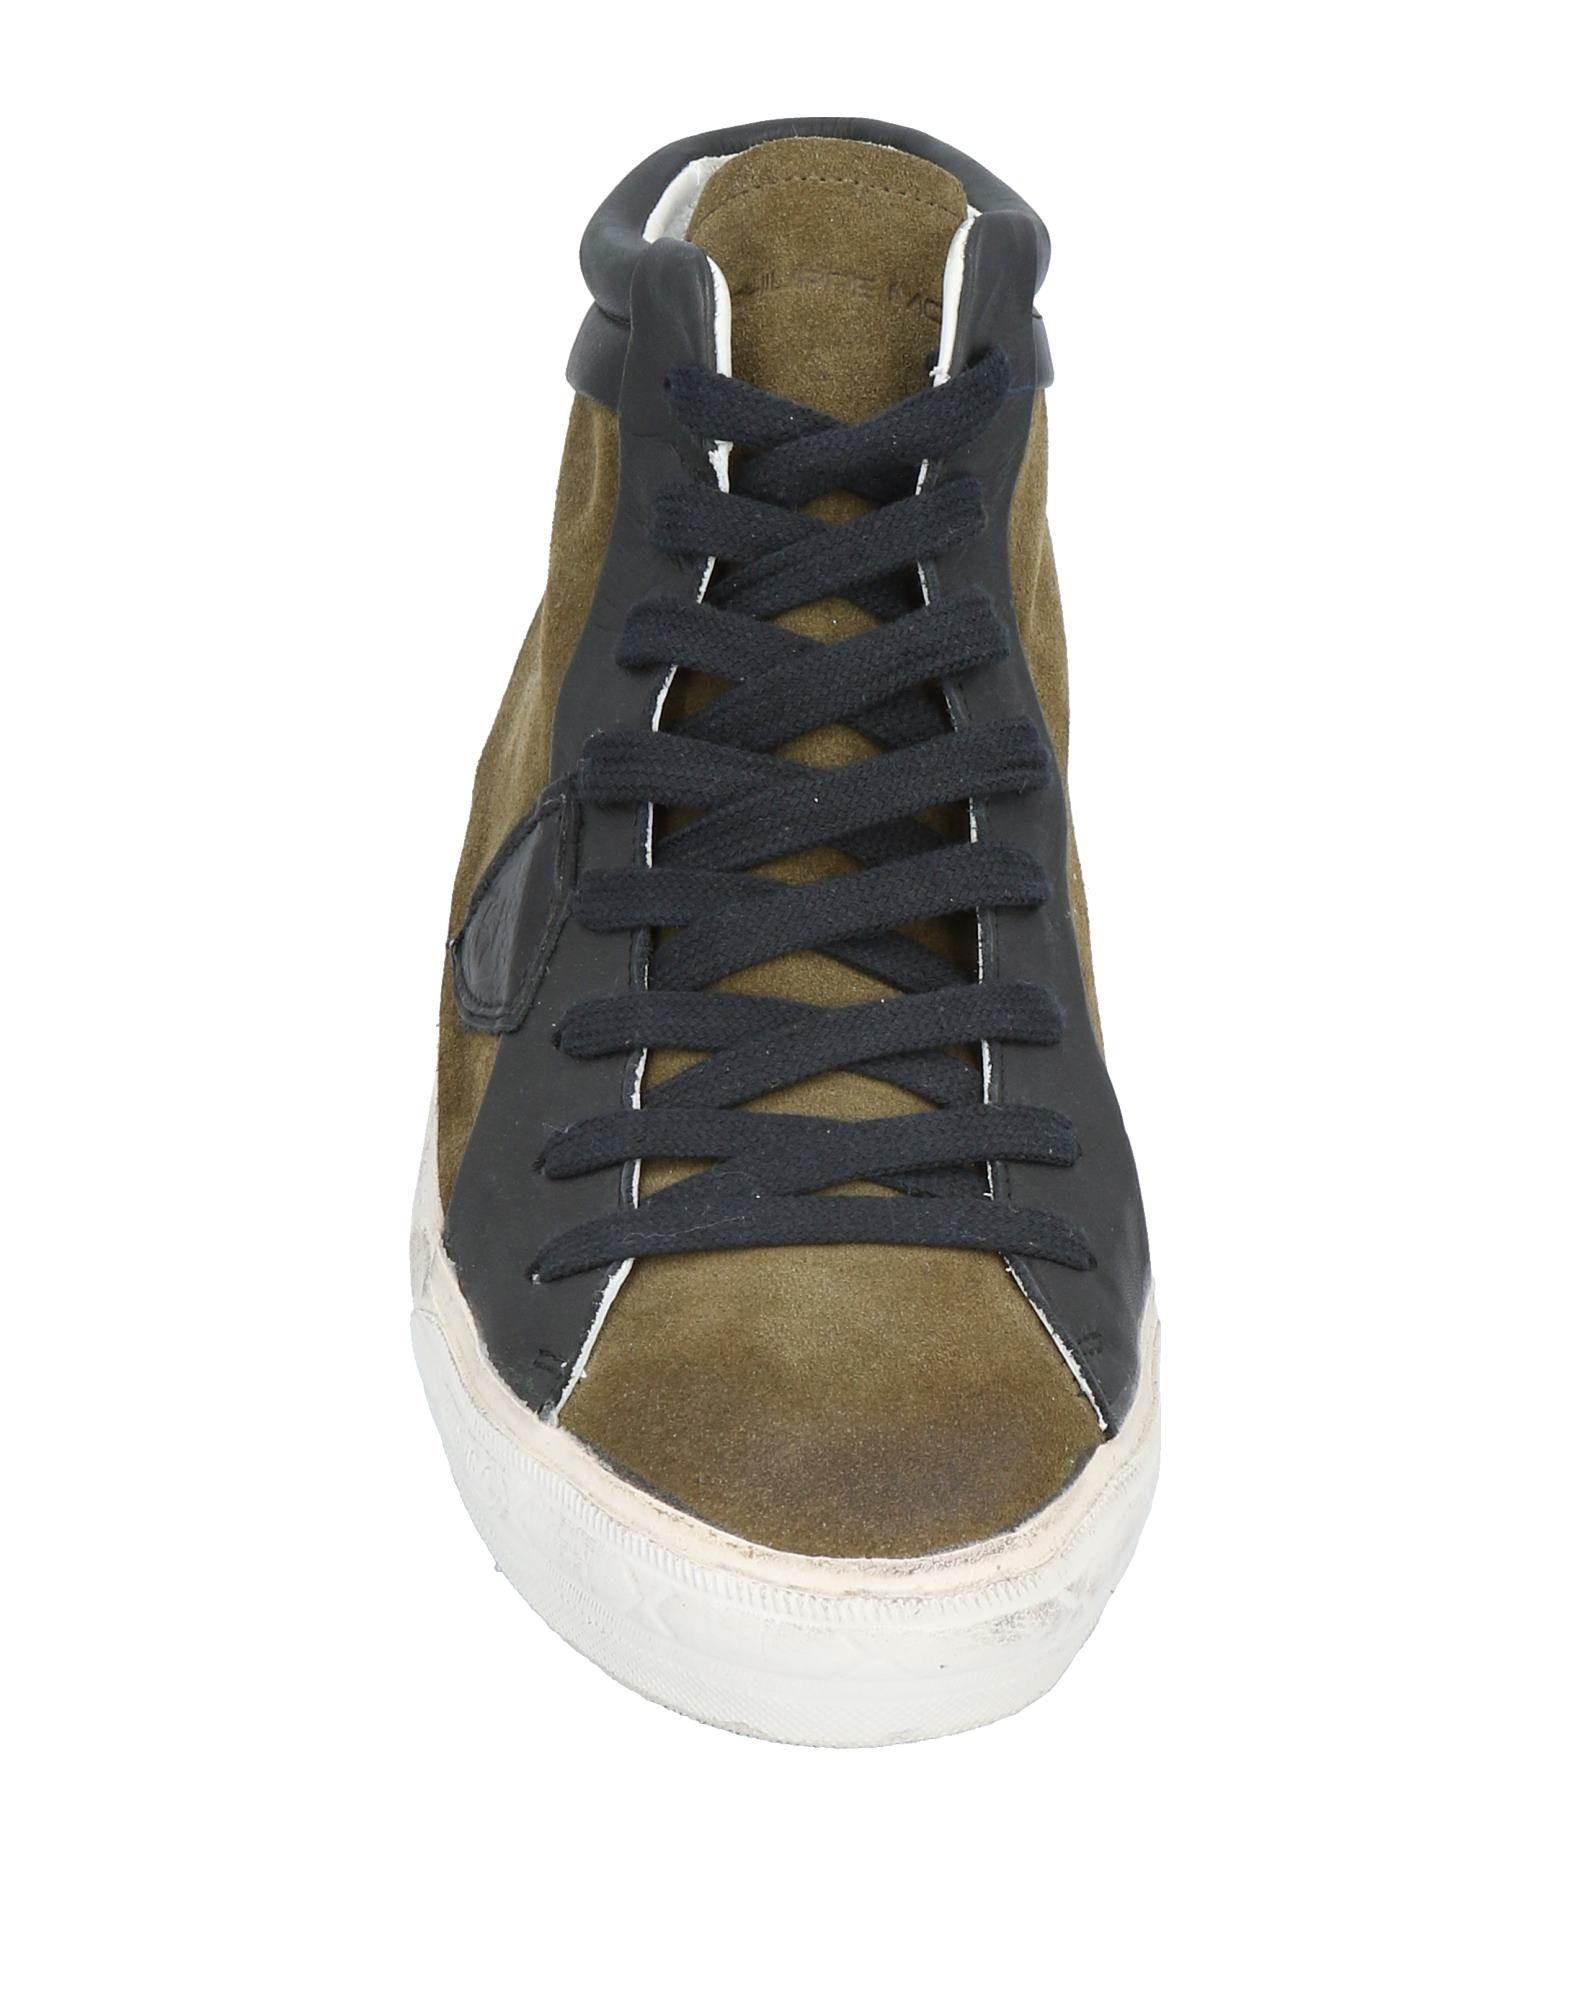 Philippe Model Sneakers Herren  Schuhe 11485170LU Gute Qualität beliebte Schuhe  1edbba